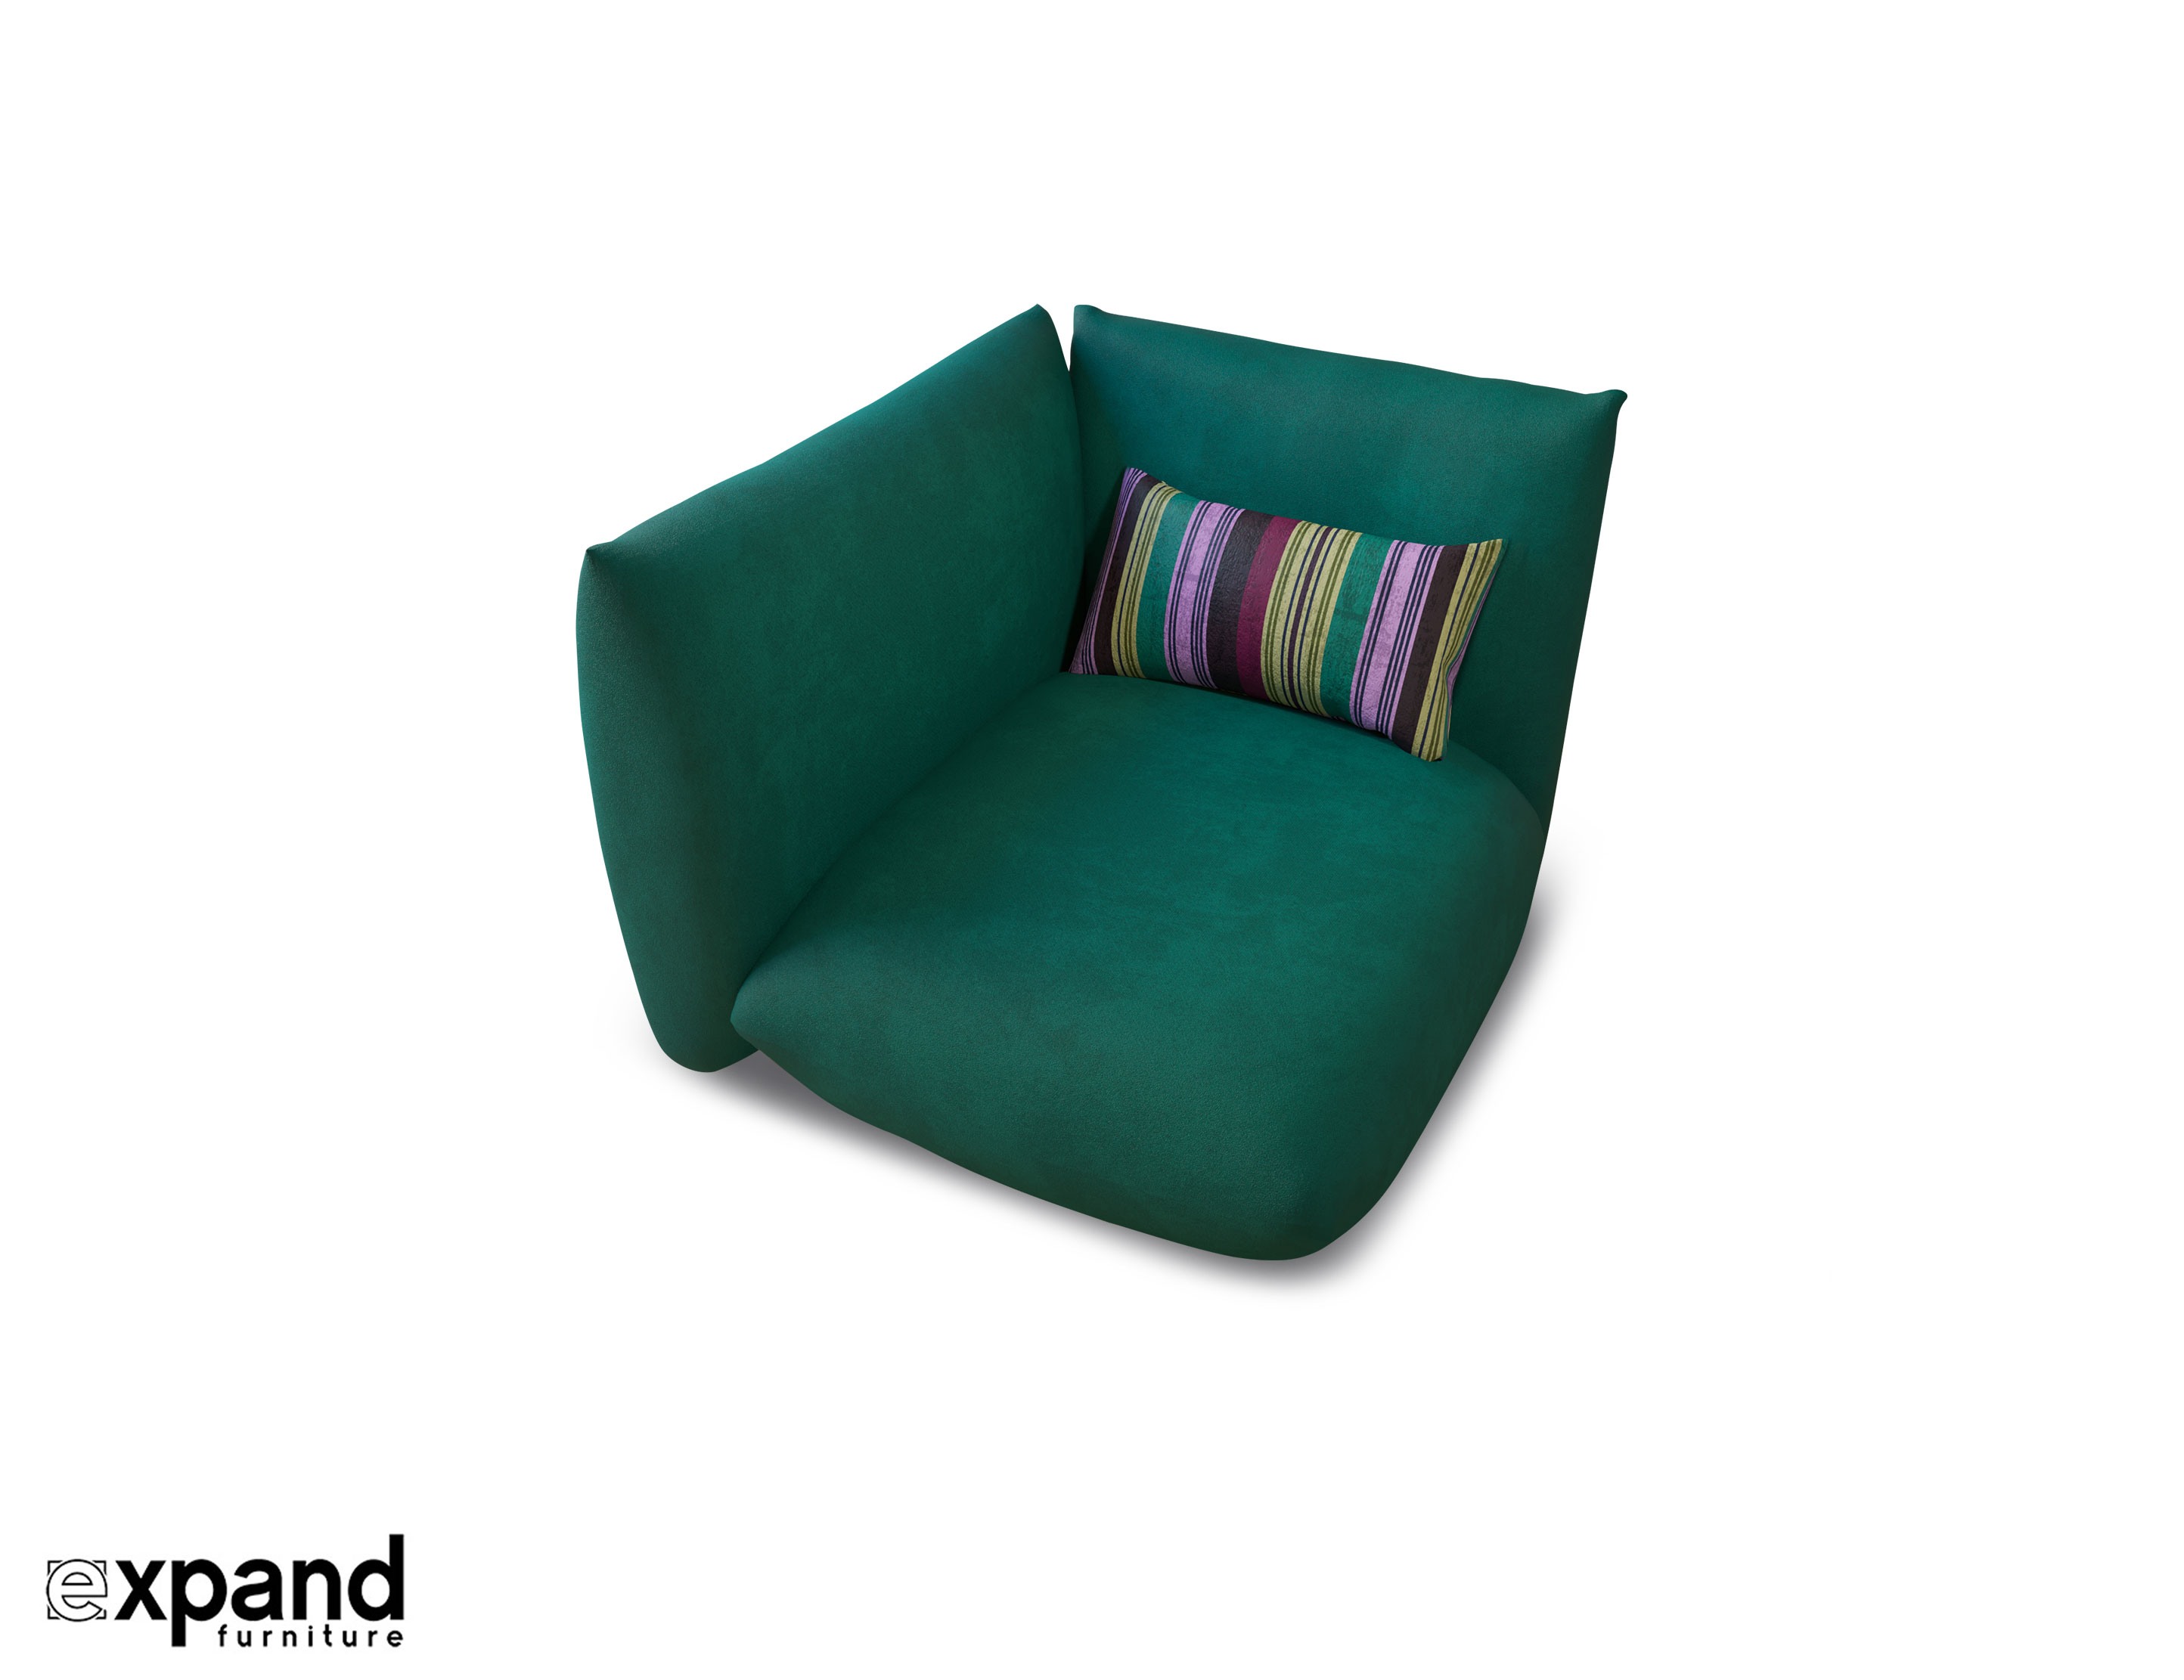 Basso Modular: Corner Sofa Low Profile design